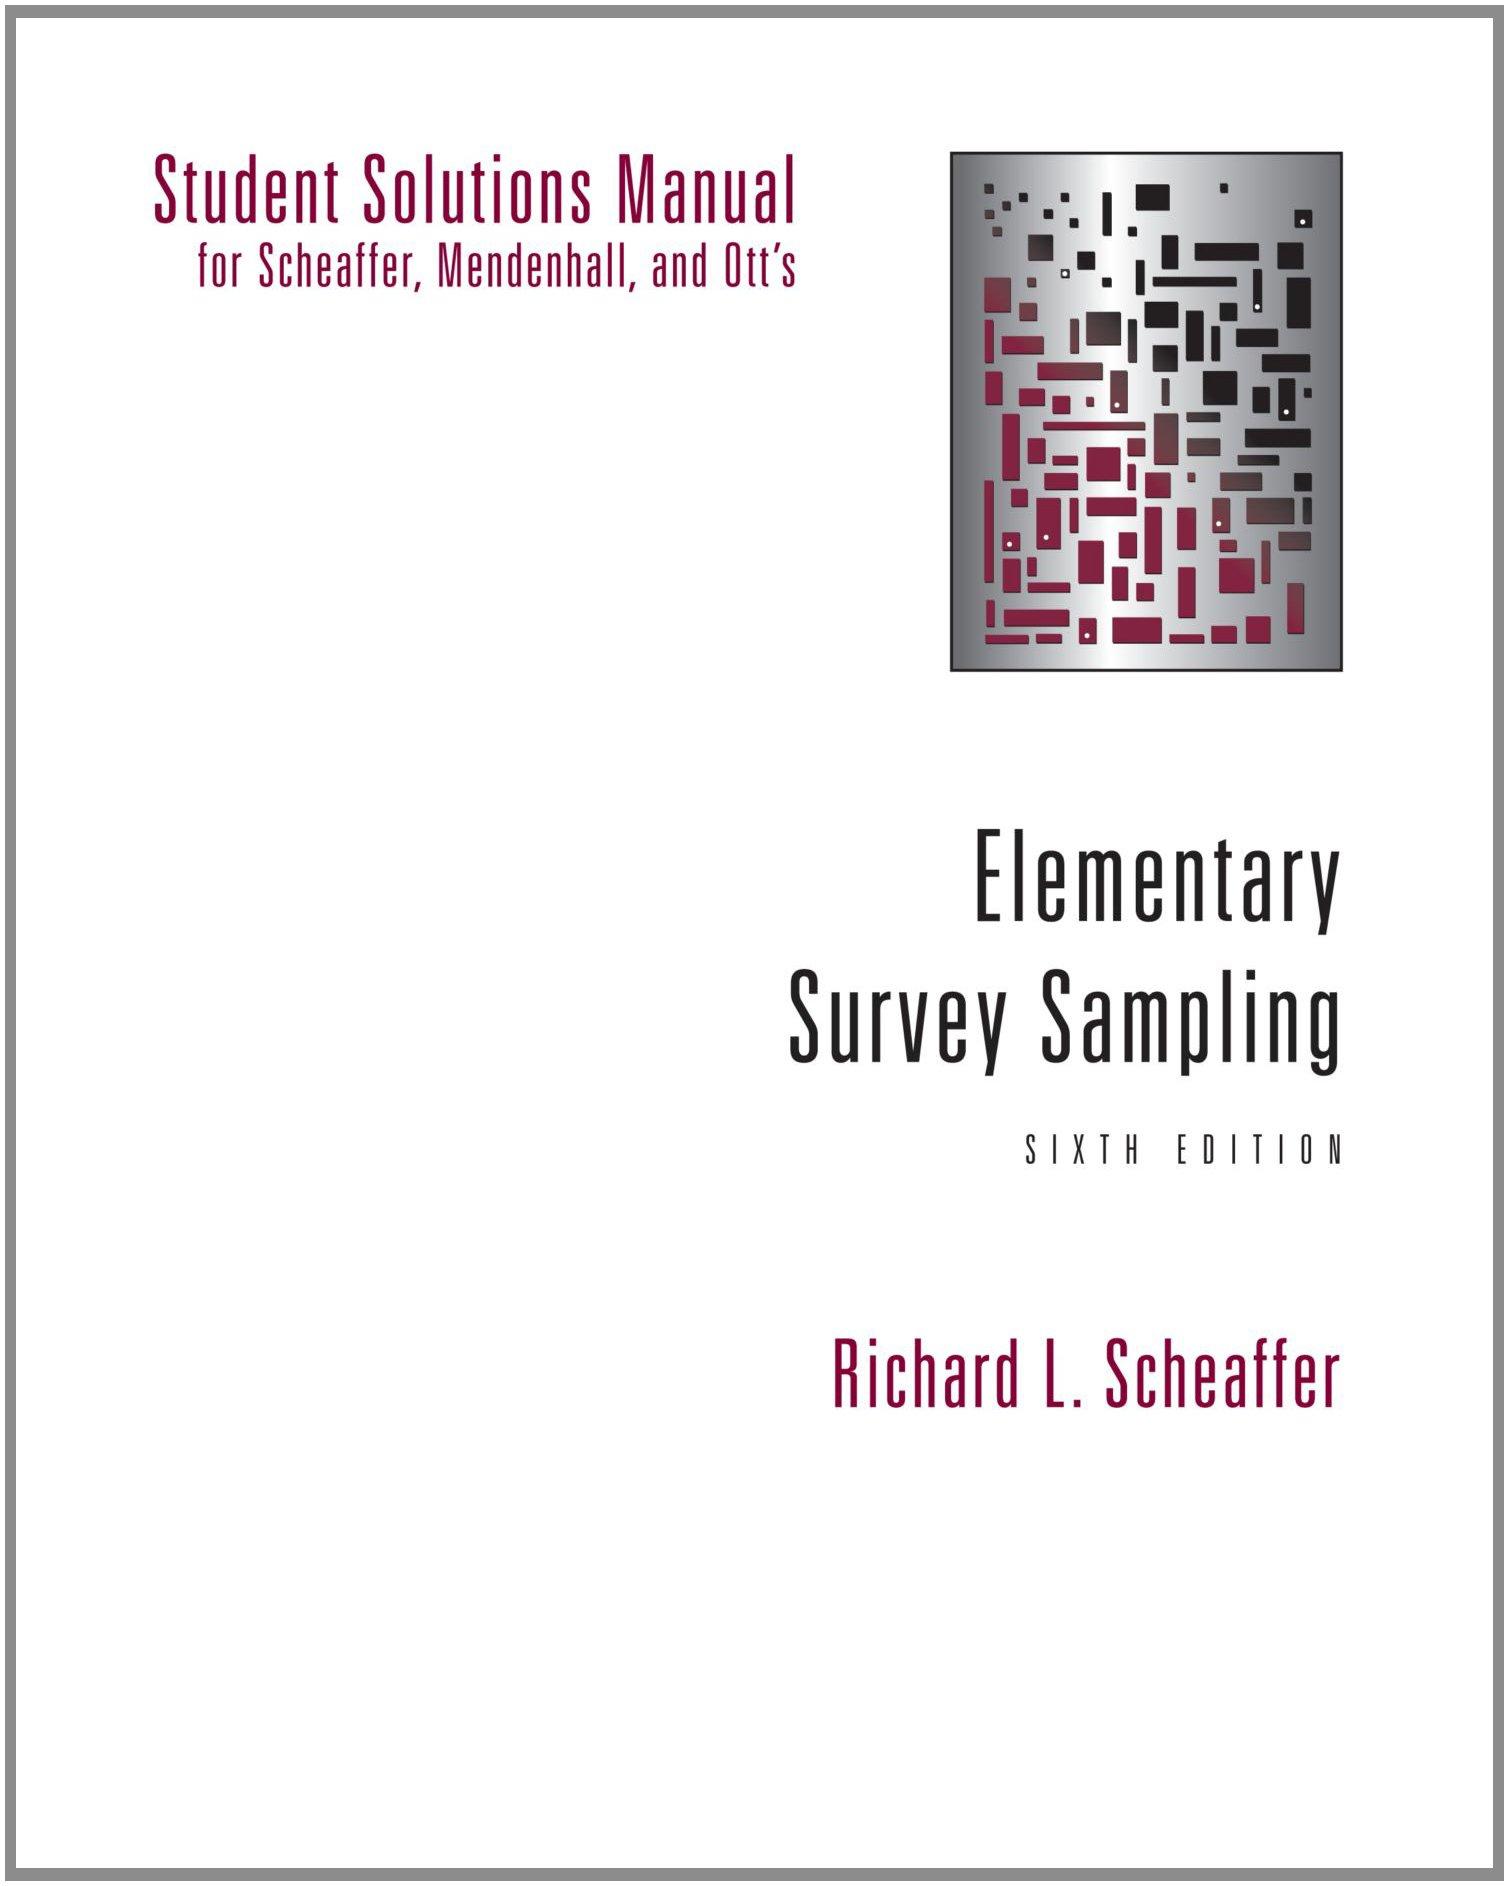 Student Solutions Manual for Scheaffer, Mendenhall, and Ott's Elementary  Survey Sampling, 6th: Richard L. Scheaffer: 9780495010173: Statistics:  Amazon ...